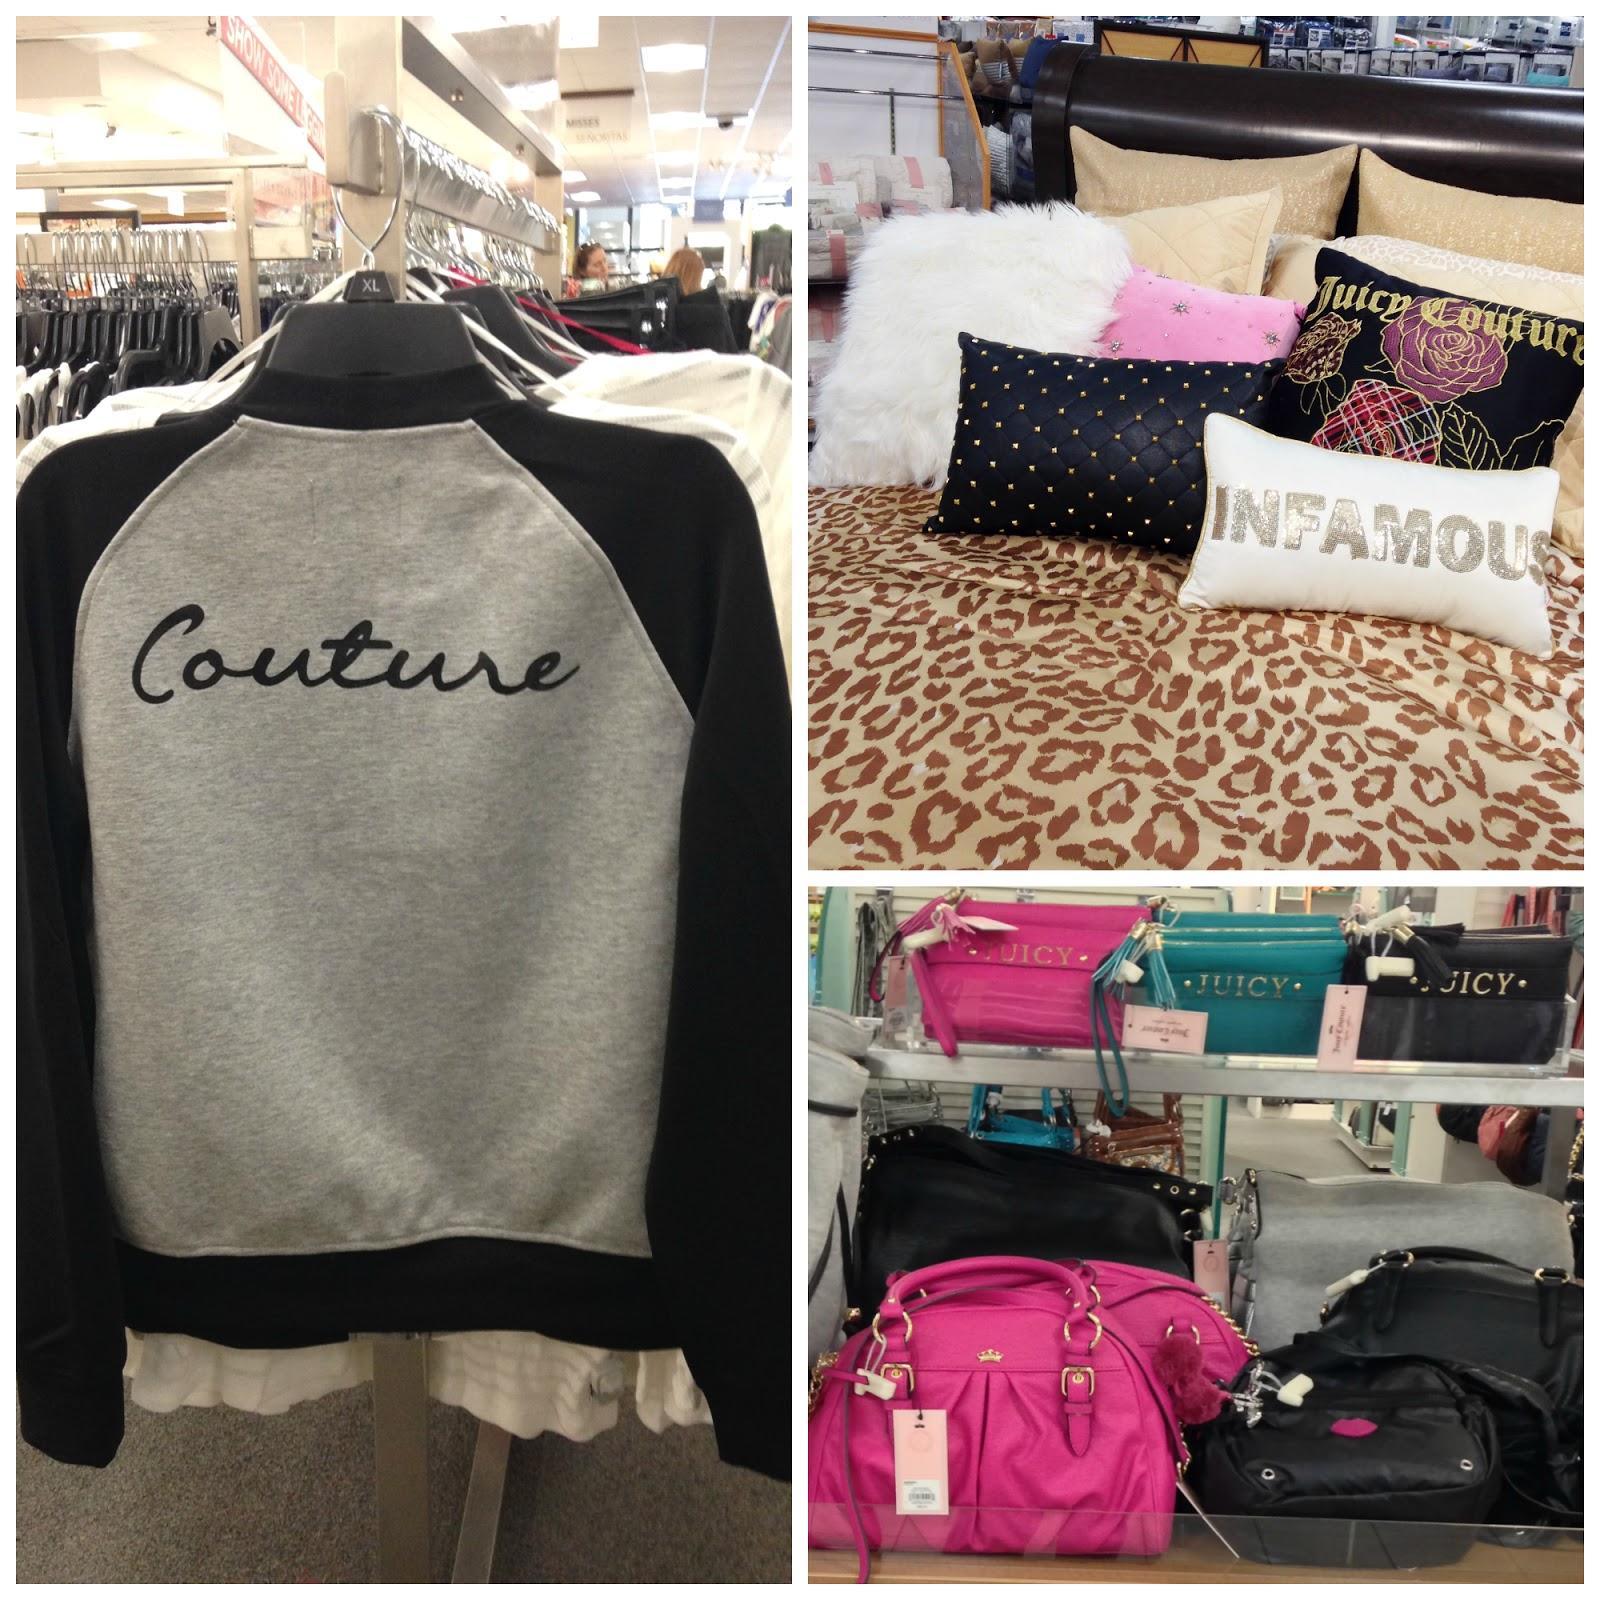 Juicy Couture At Kohls Pics My 5 Favorites